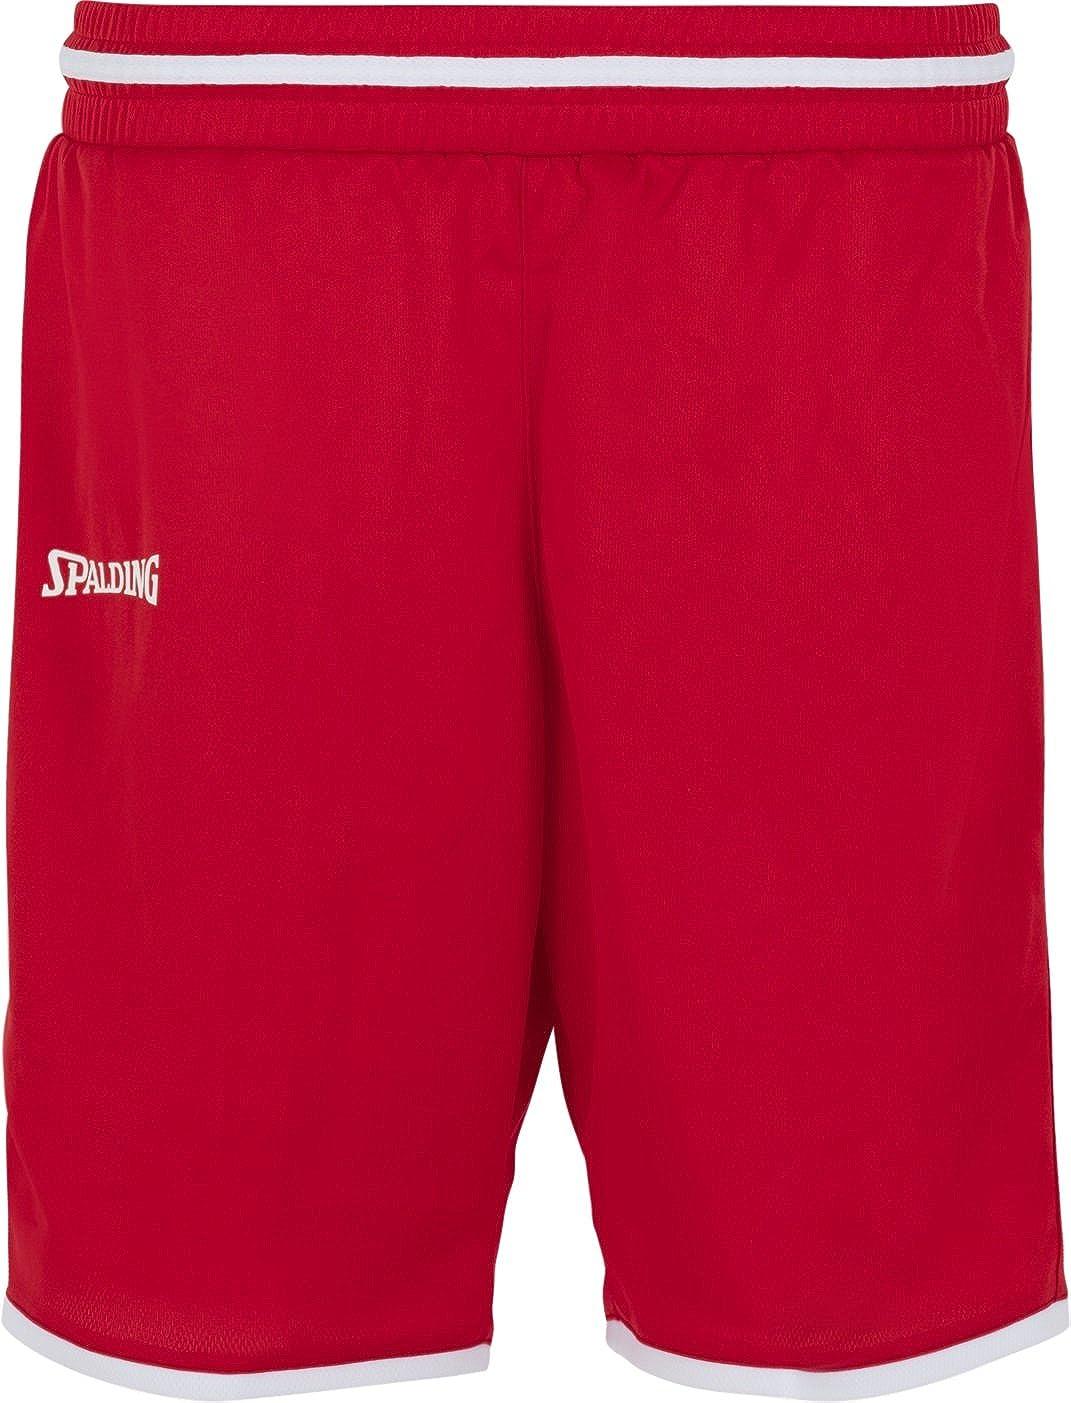 Spalding Short Move Femme Pantalons